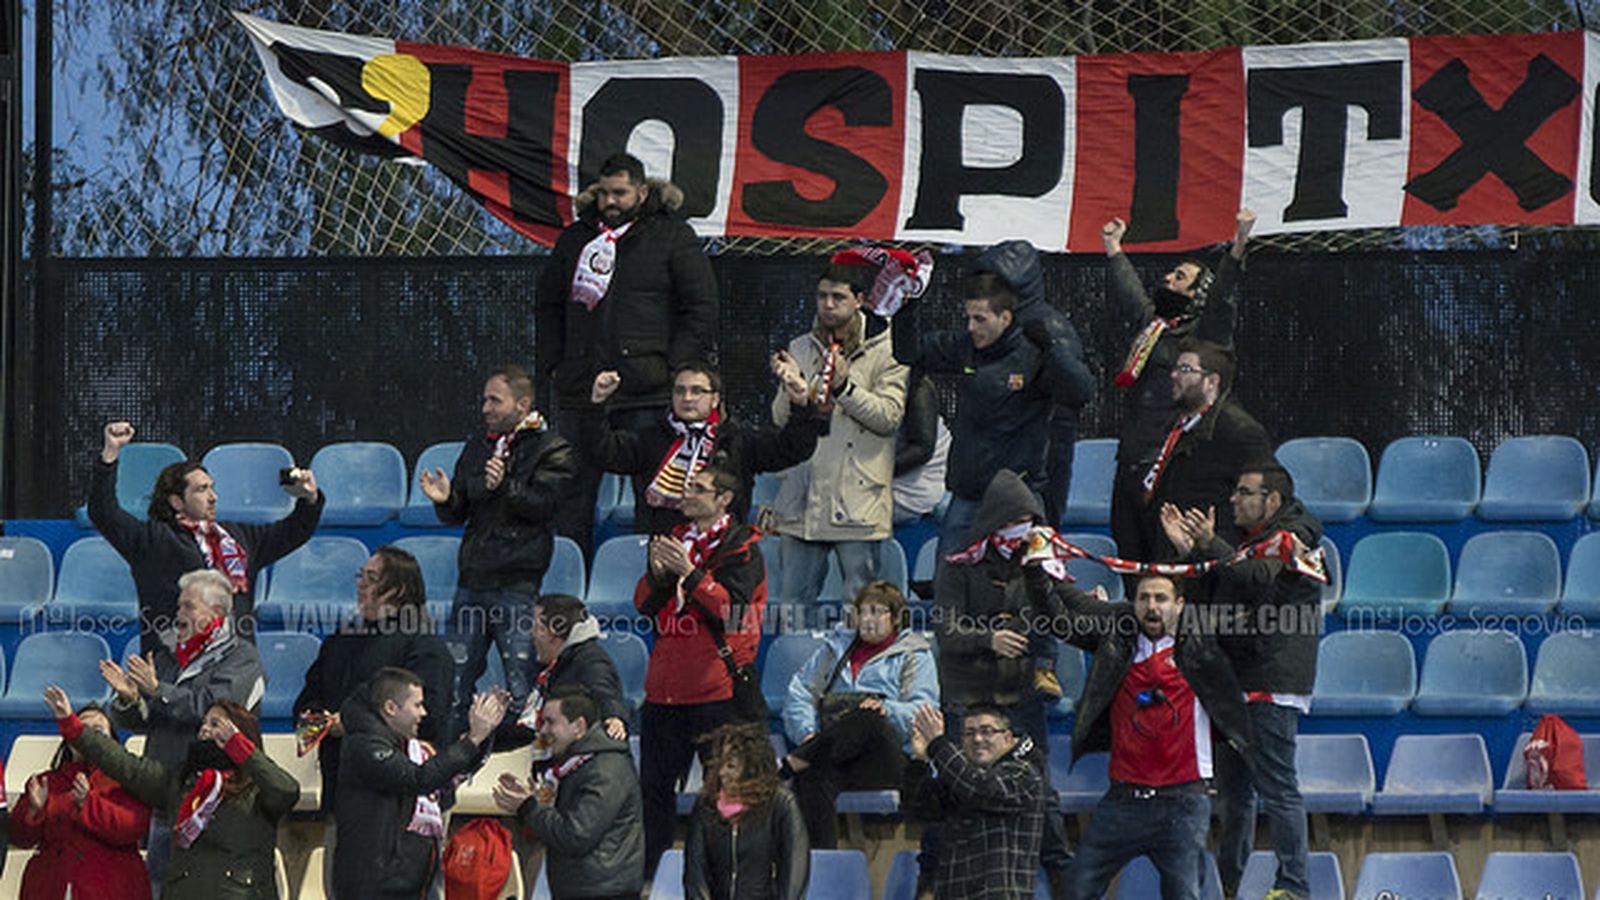 Villarreal begin their preseason tomorrow against L'Hospitalet de ... - Villarreal USA (blog)